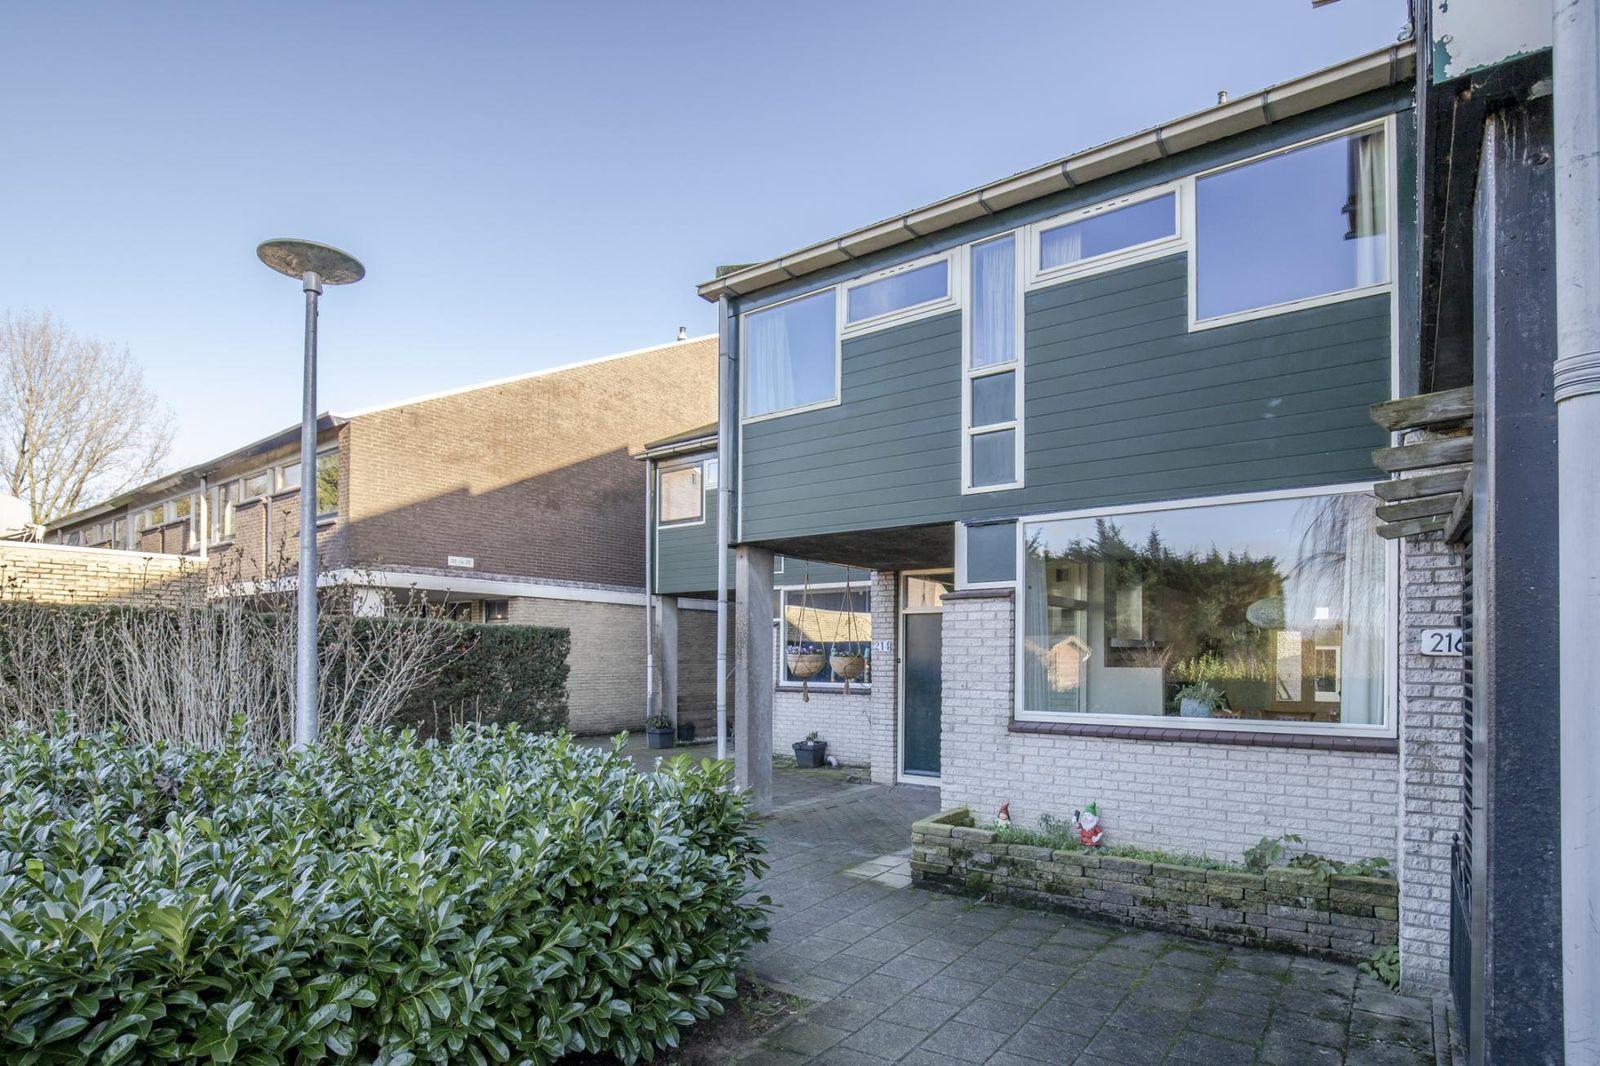 Mosterdhof 214, Westervoort